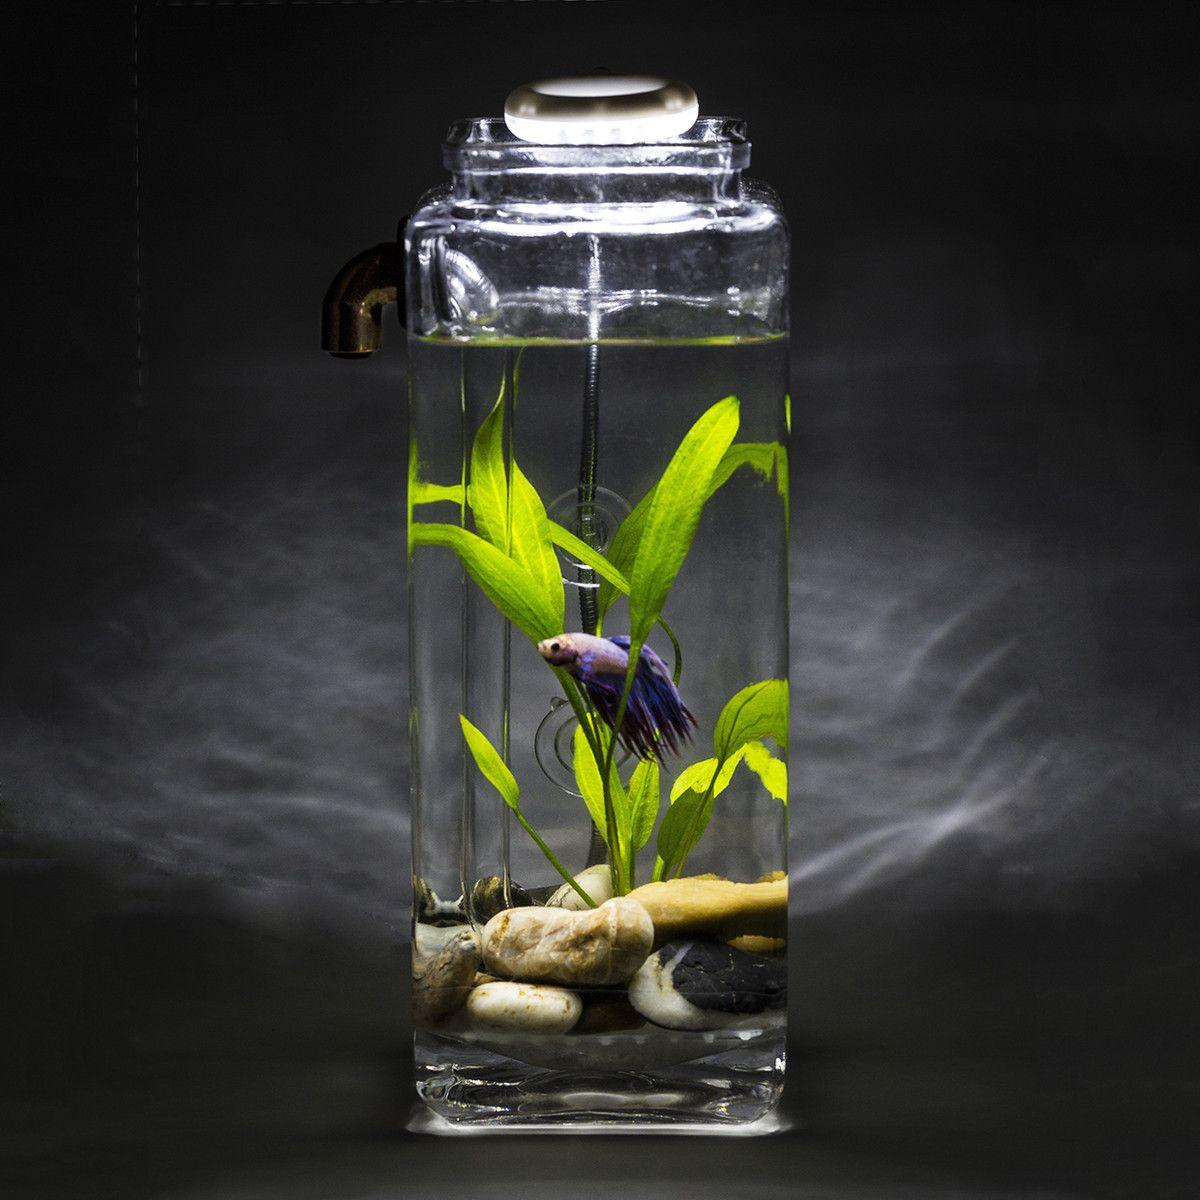 No clean aquarium betta fish tank - Betta Fish With Fancy Self Cleaning Aquarium And Led Light Man I Should So Get